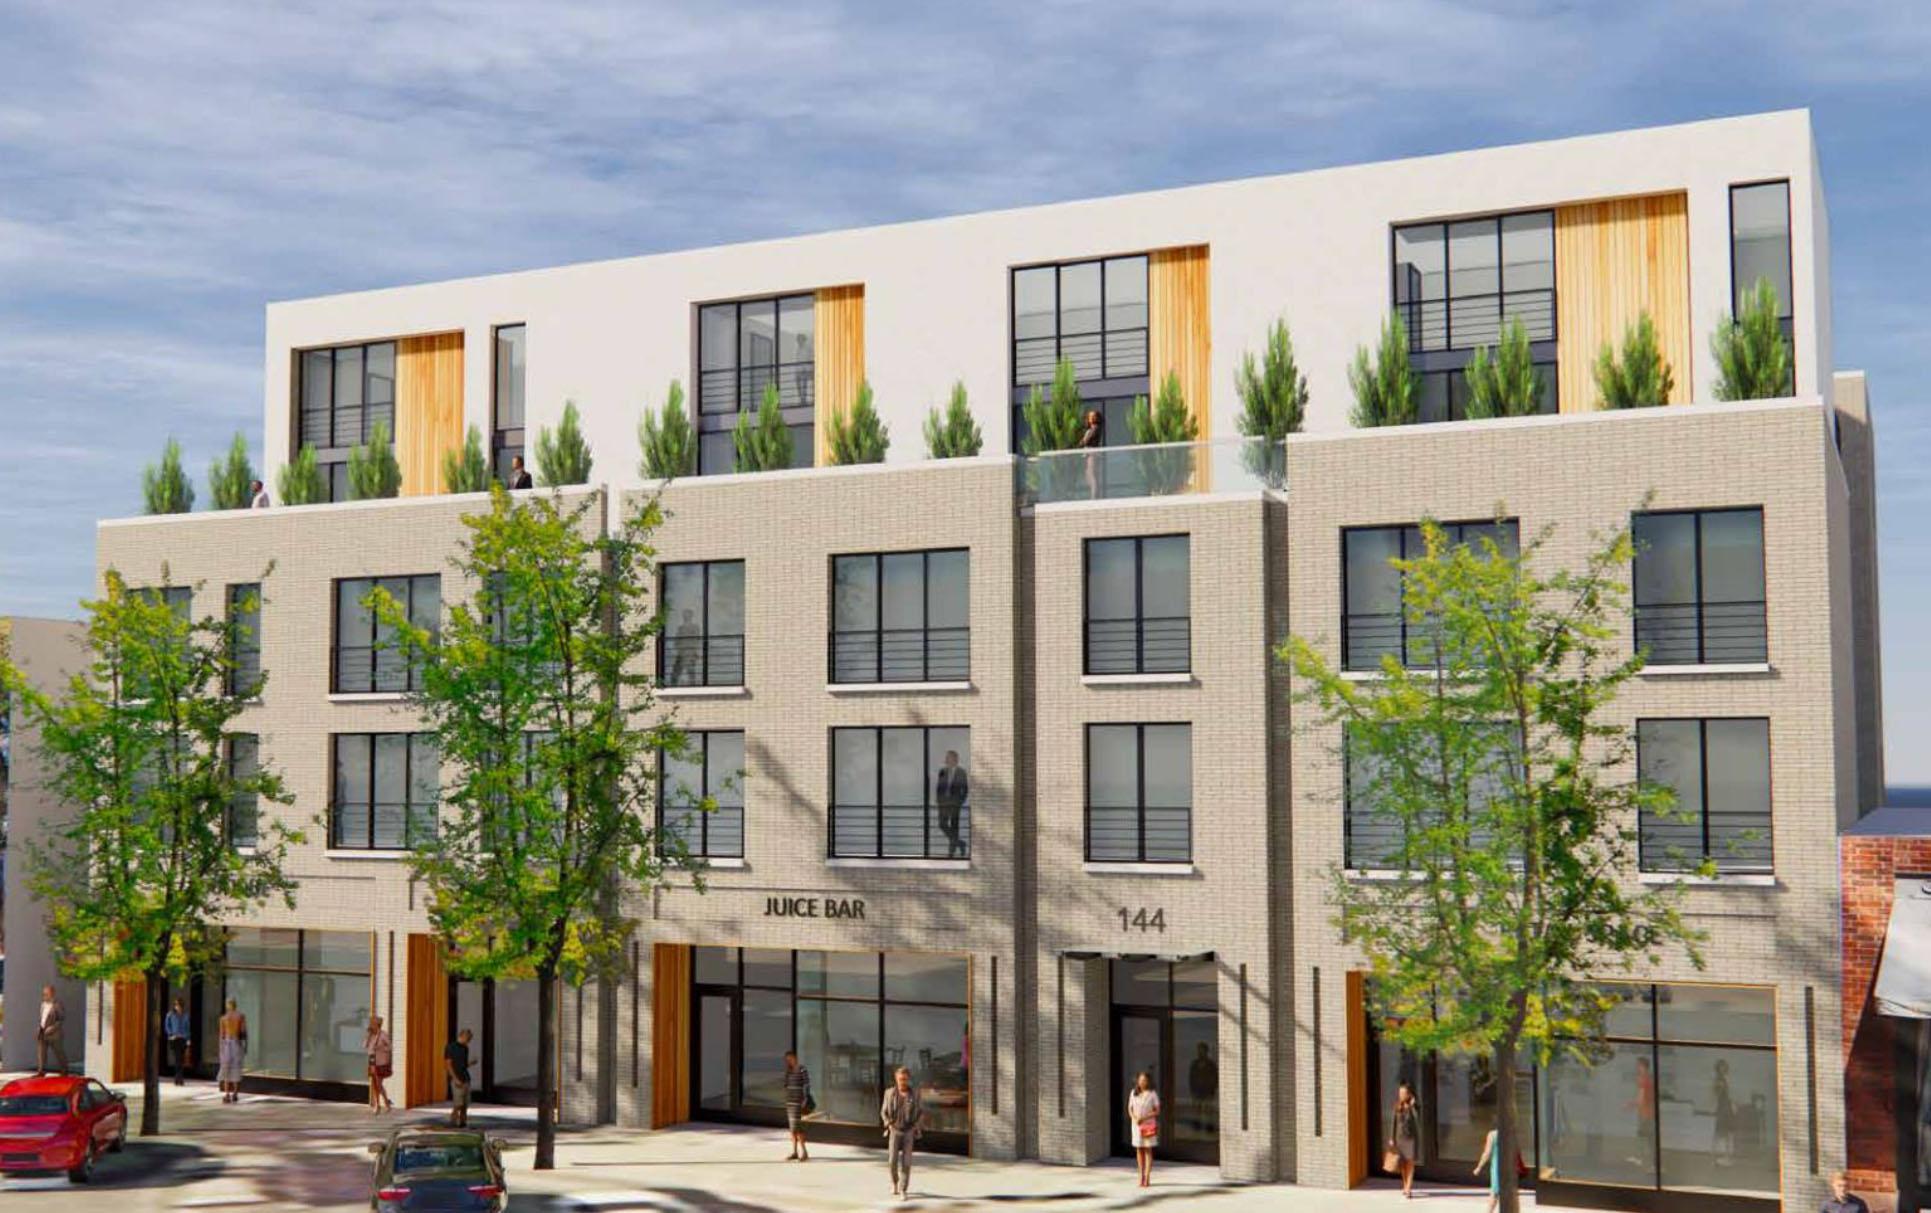 OGDEN RISING: New Historic 25th Street Massive Mixed-Use Development